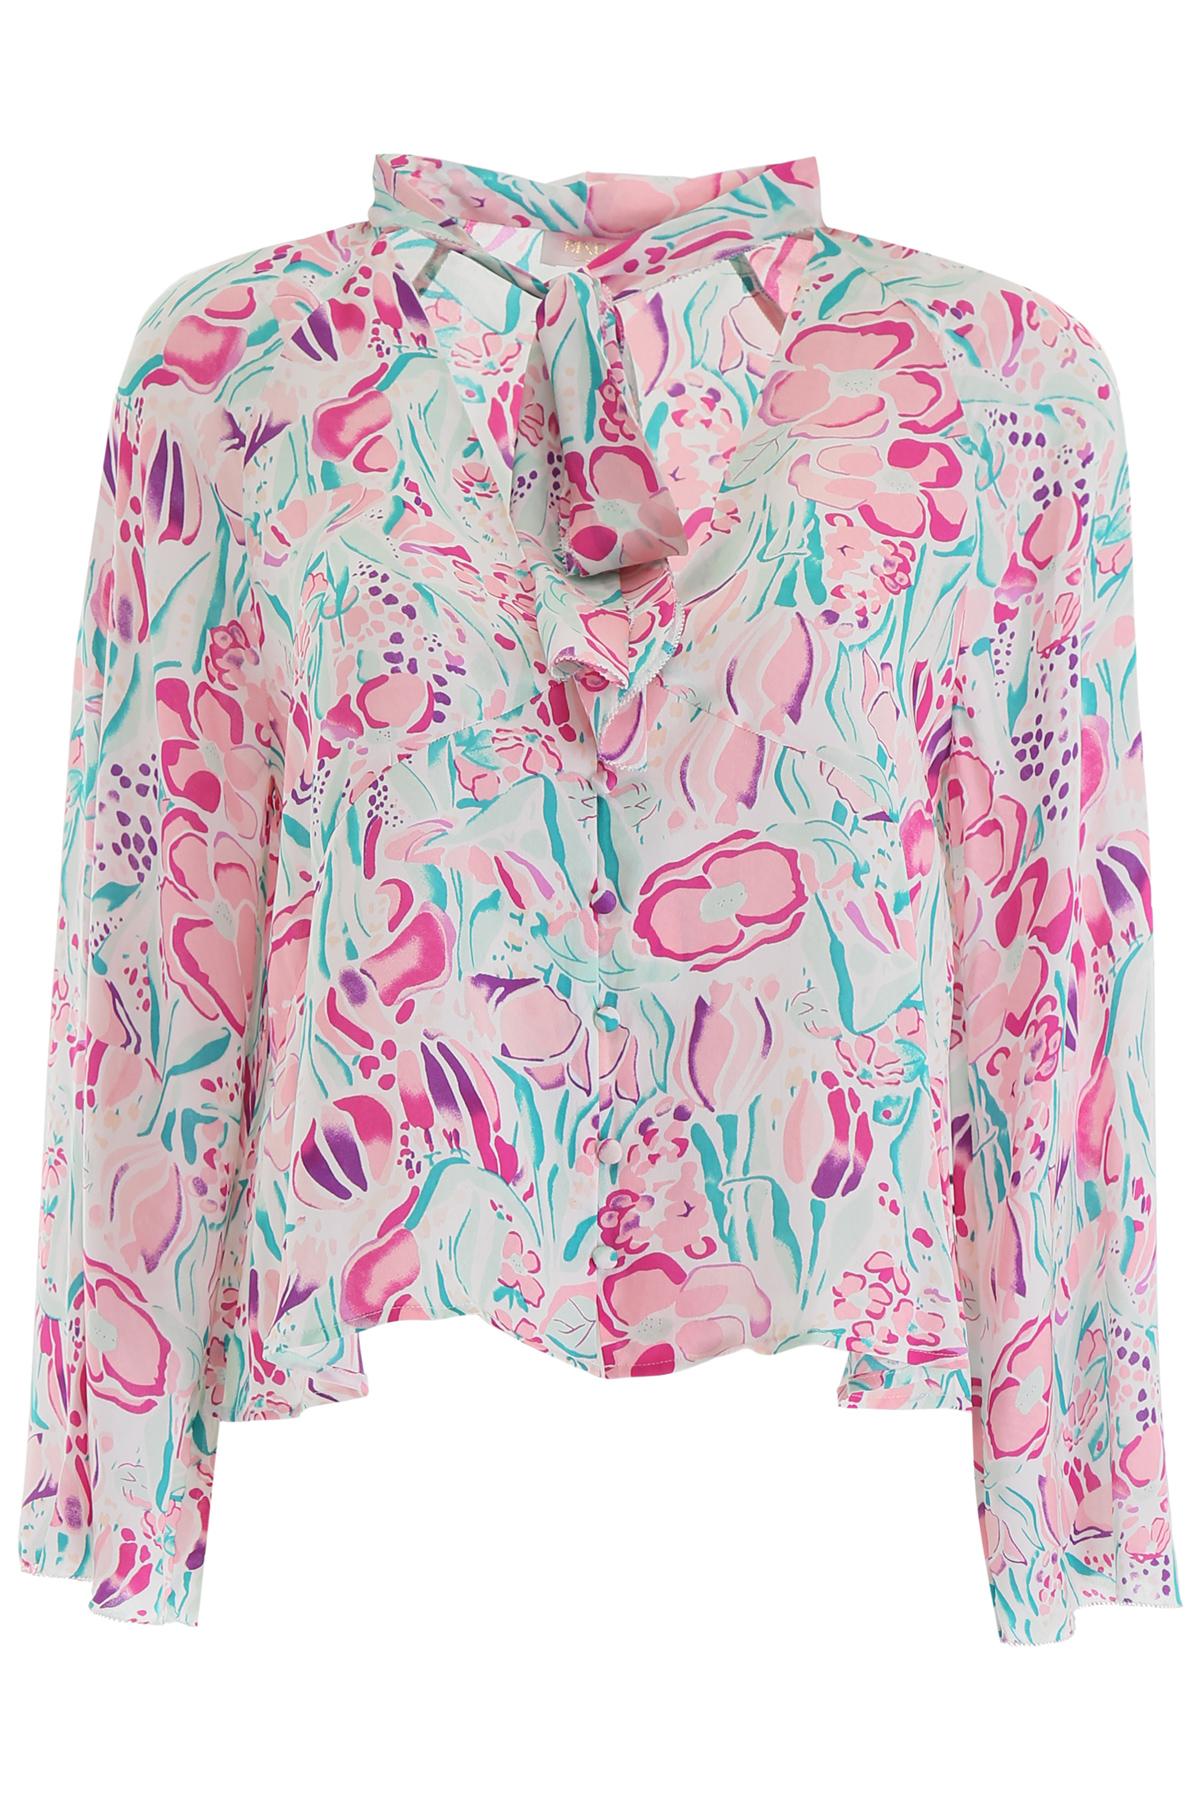 RIXO LONDON KIM BLOUSE 12 Pink, Fuchsia, Green